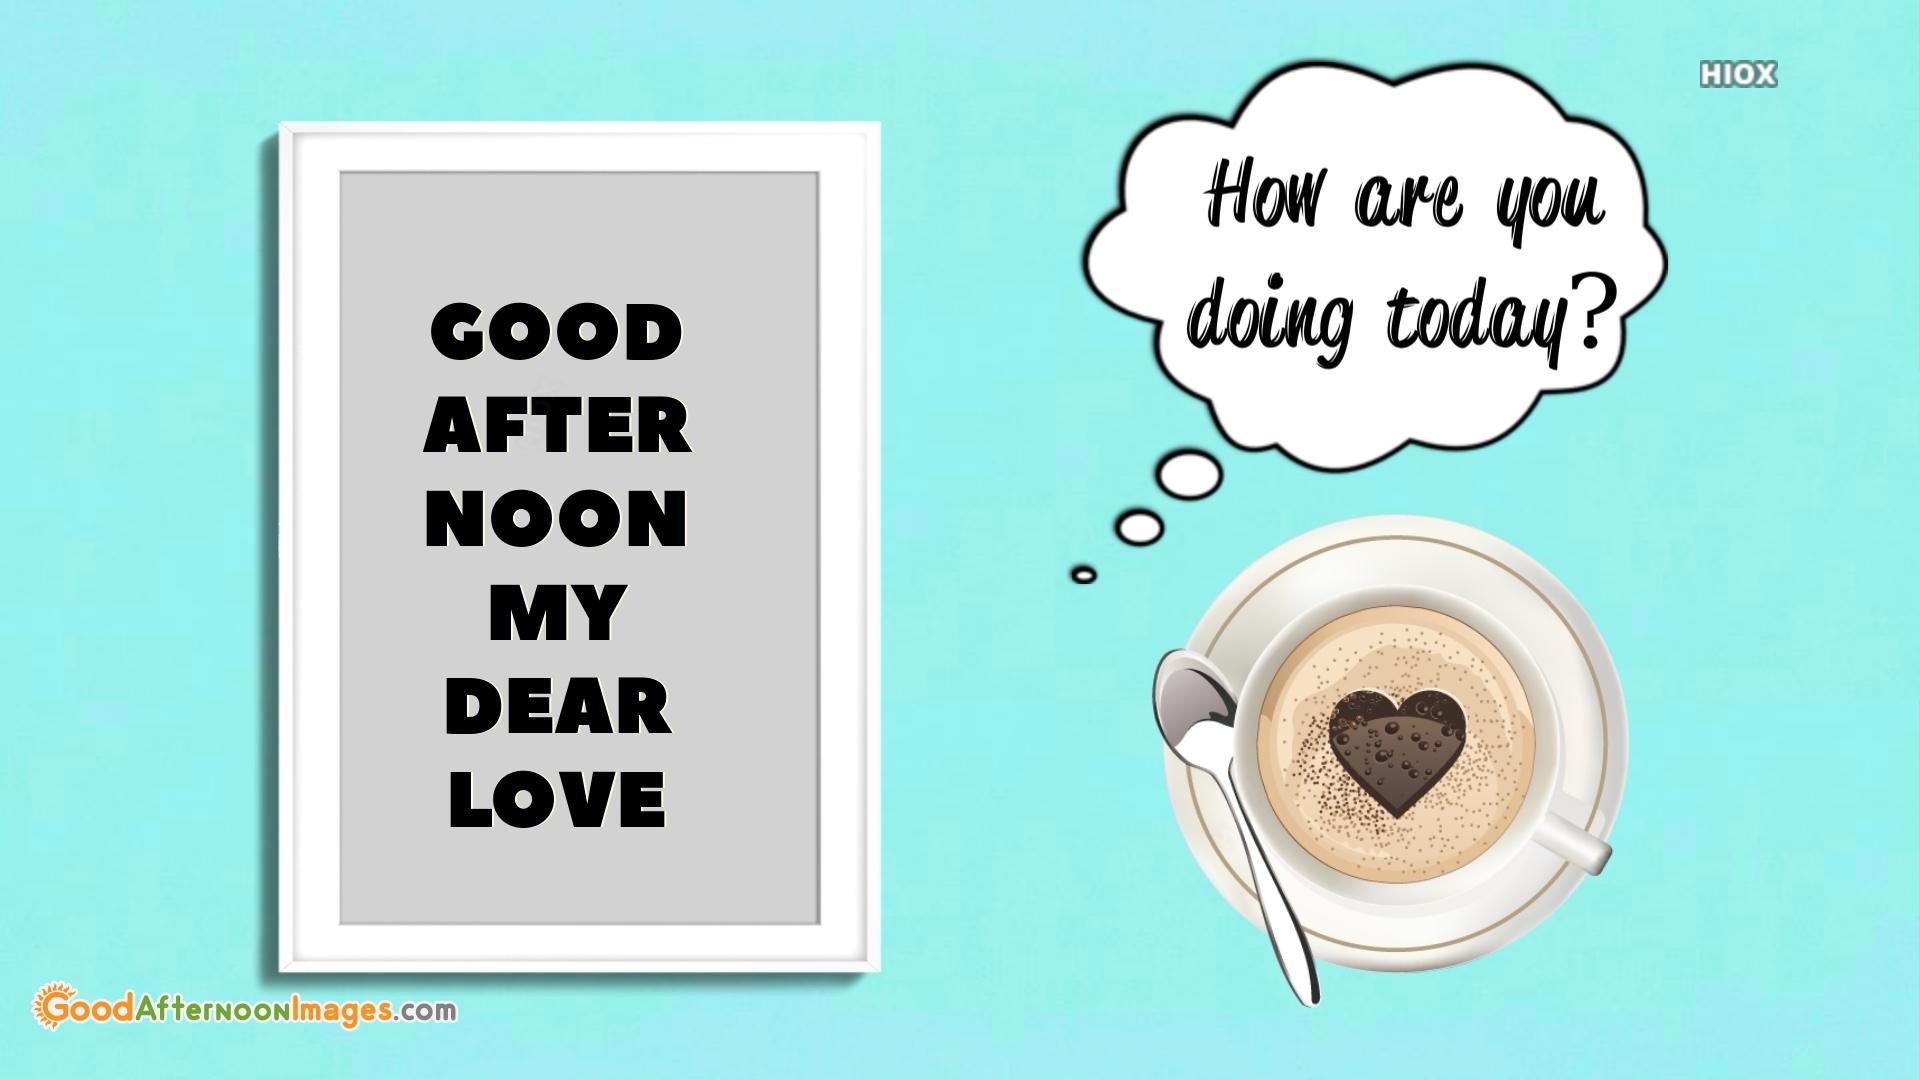 Good Afternoon My Dear Love